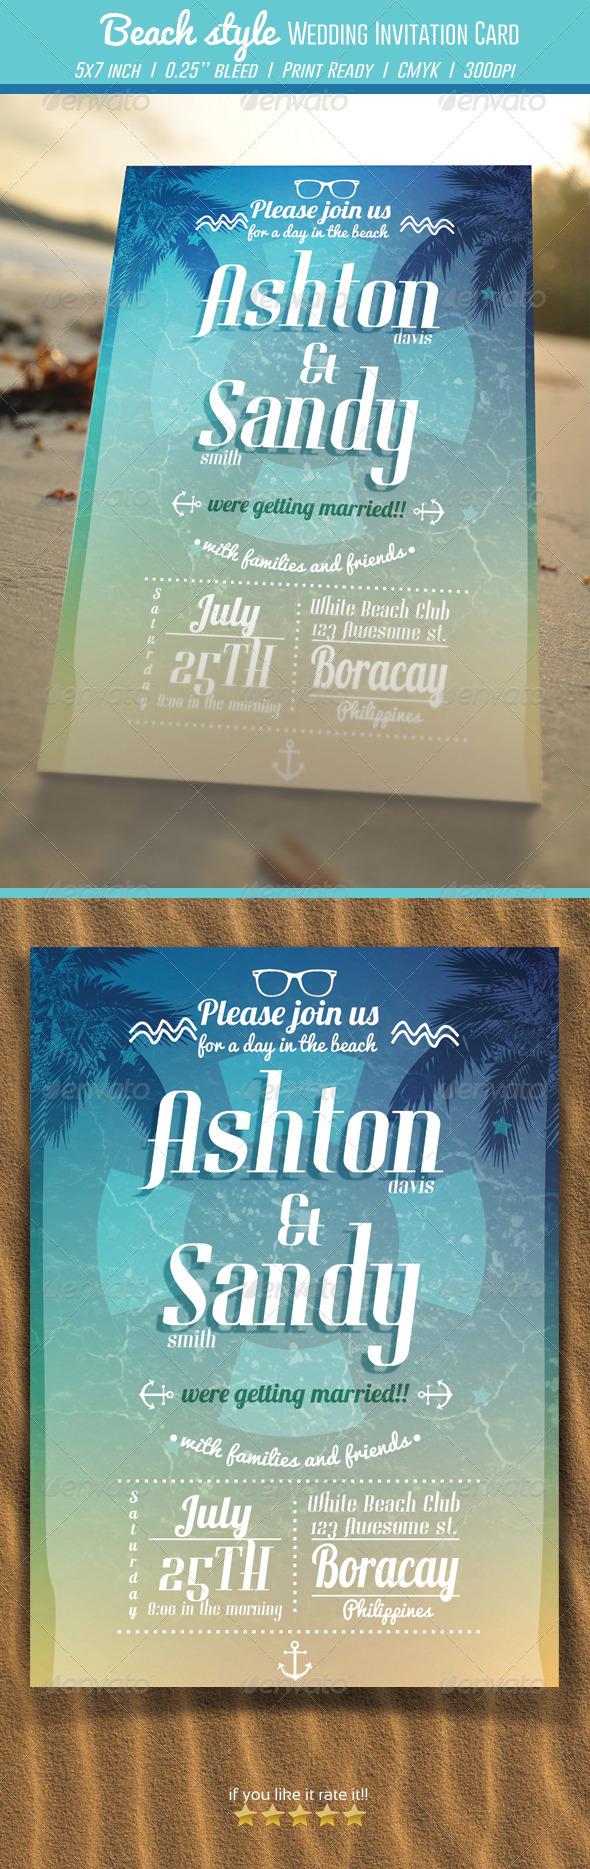 Beach Style Wedding Invitation Card - Weddings Cards & Invites